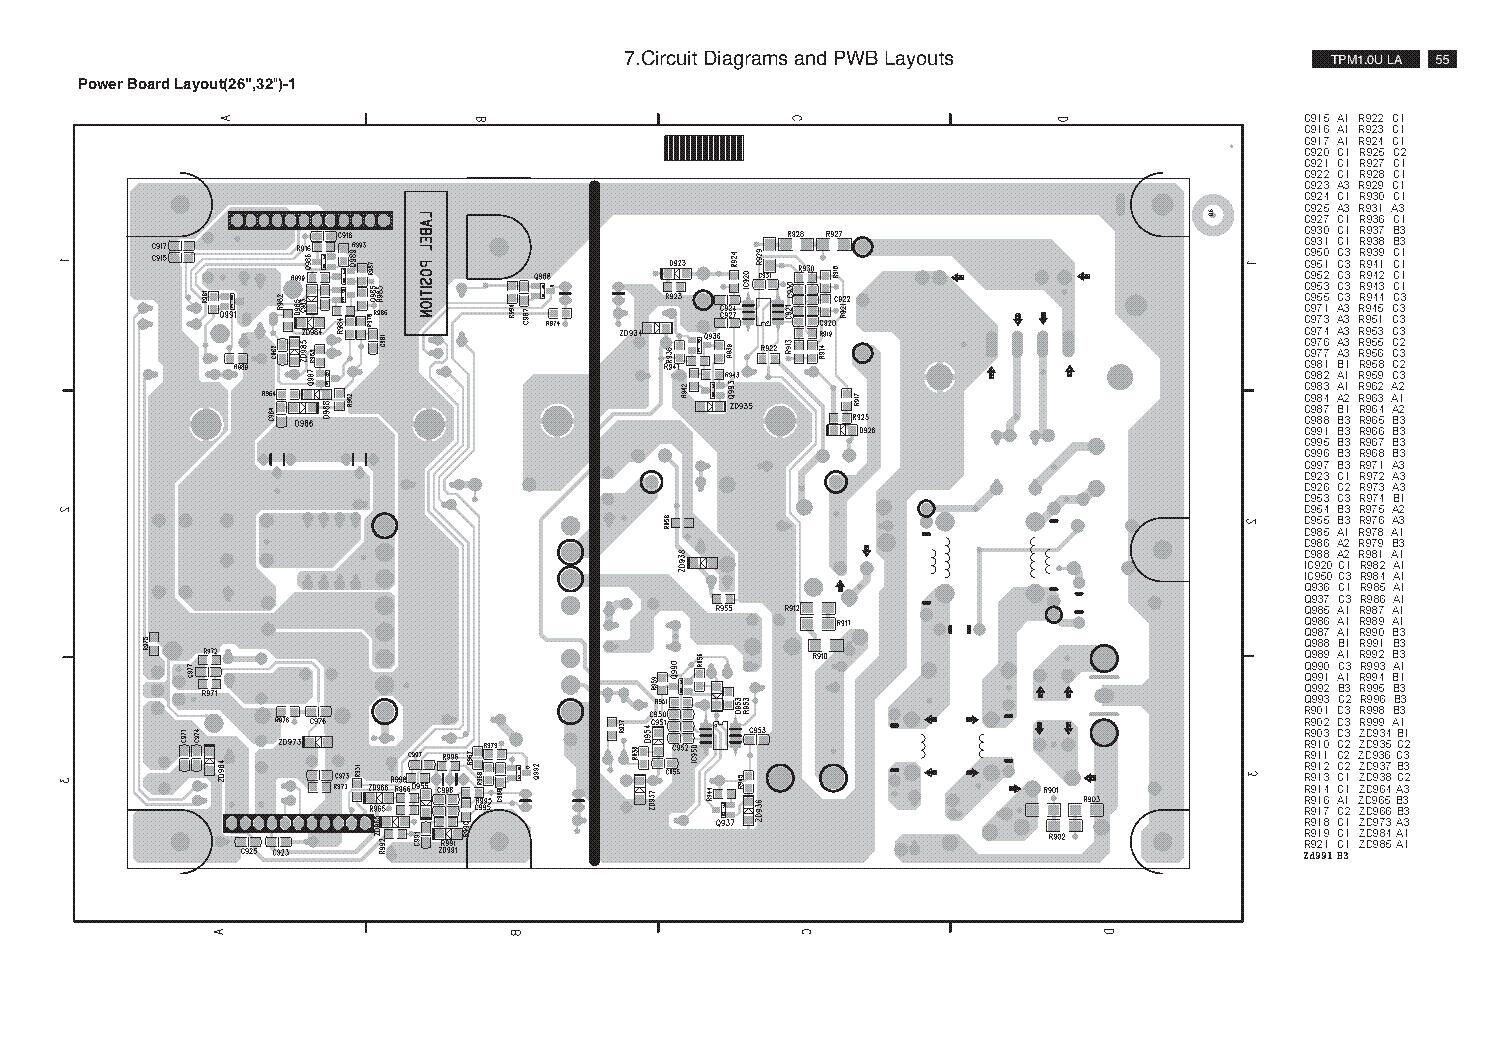 PHILIPS 715T2190-1 TPM1 0ULA PSU Service Manual download, schematics